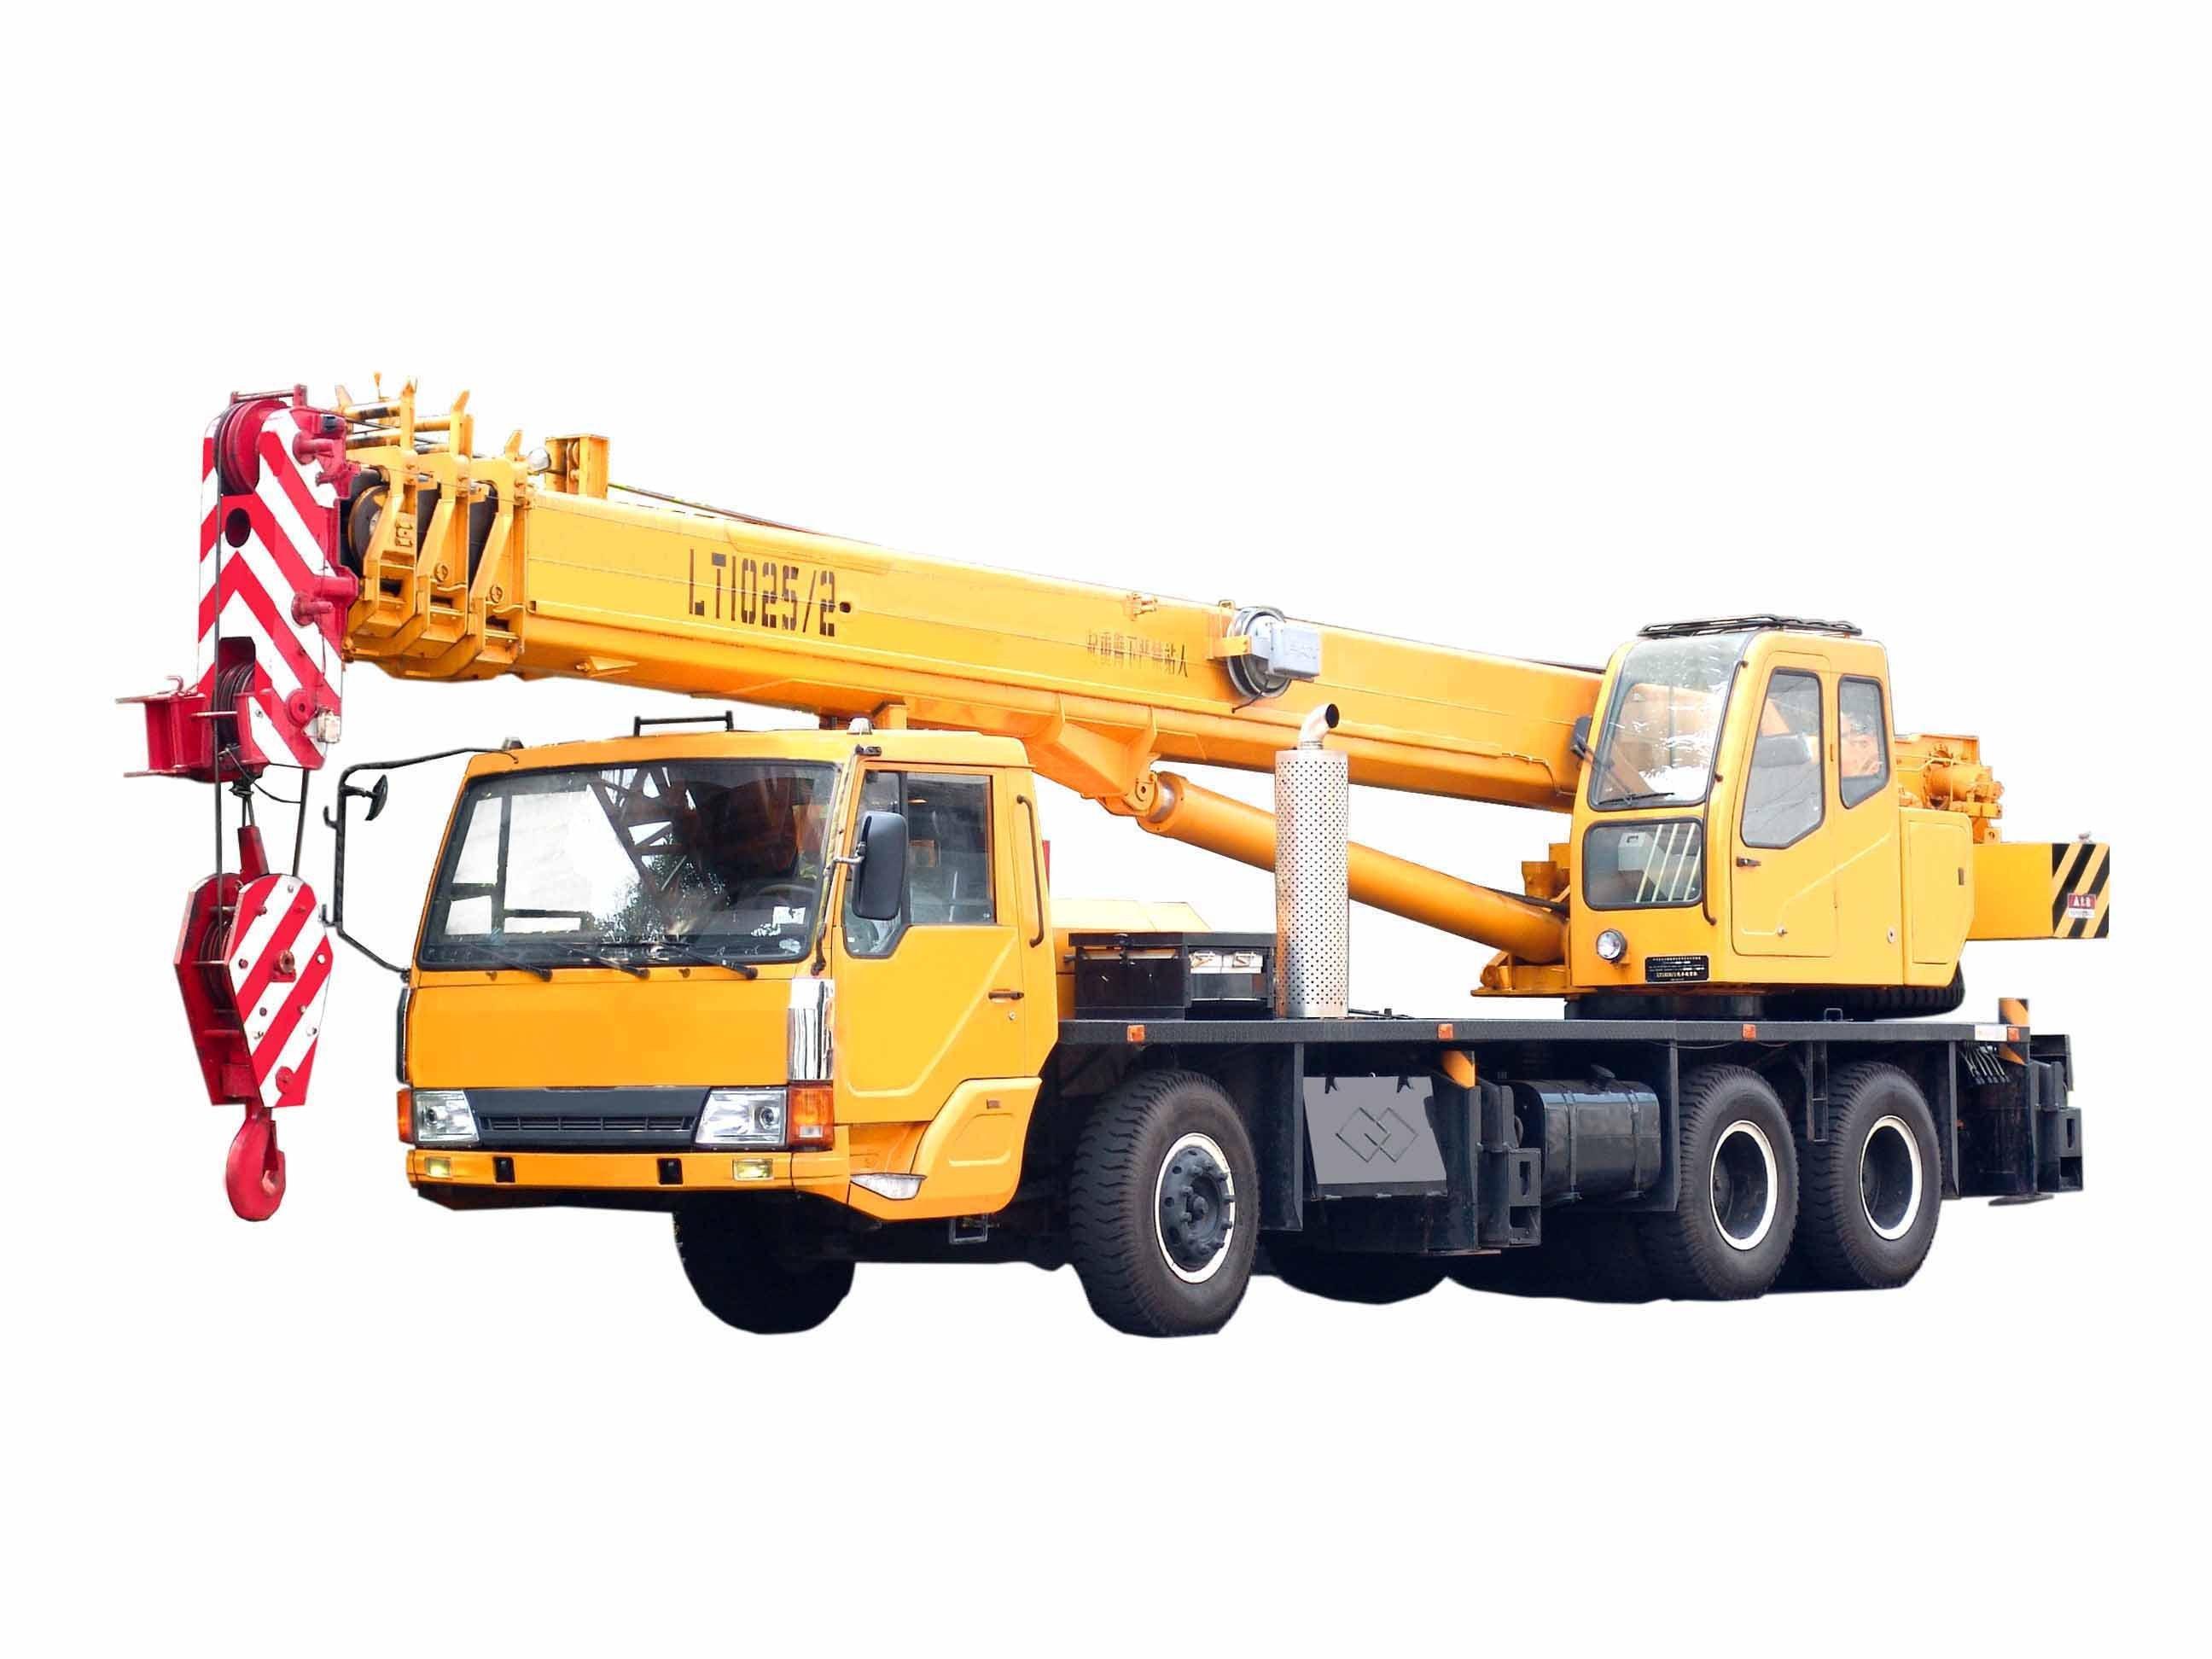 Mobile Crane Terminology : Mobile crane construction truck semi tractor ariel cranes